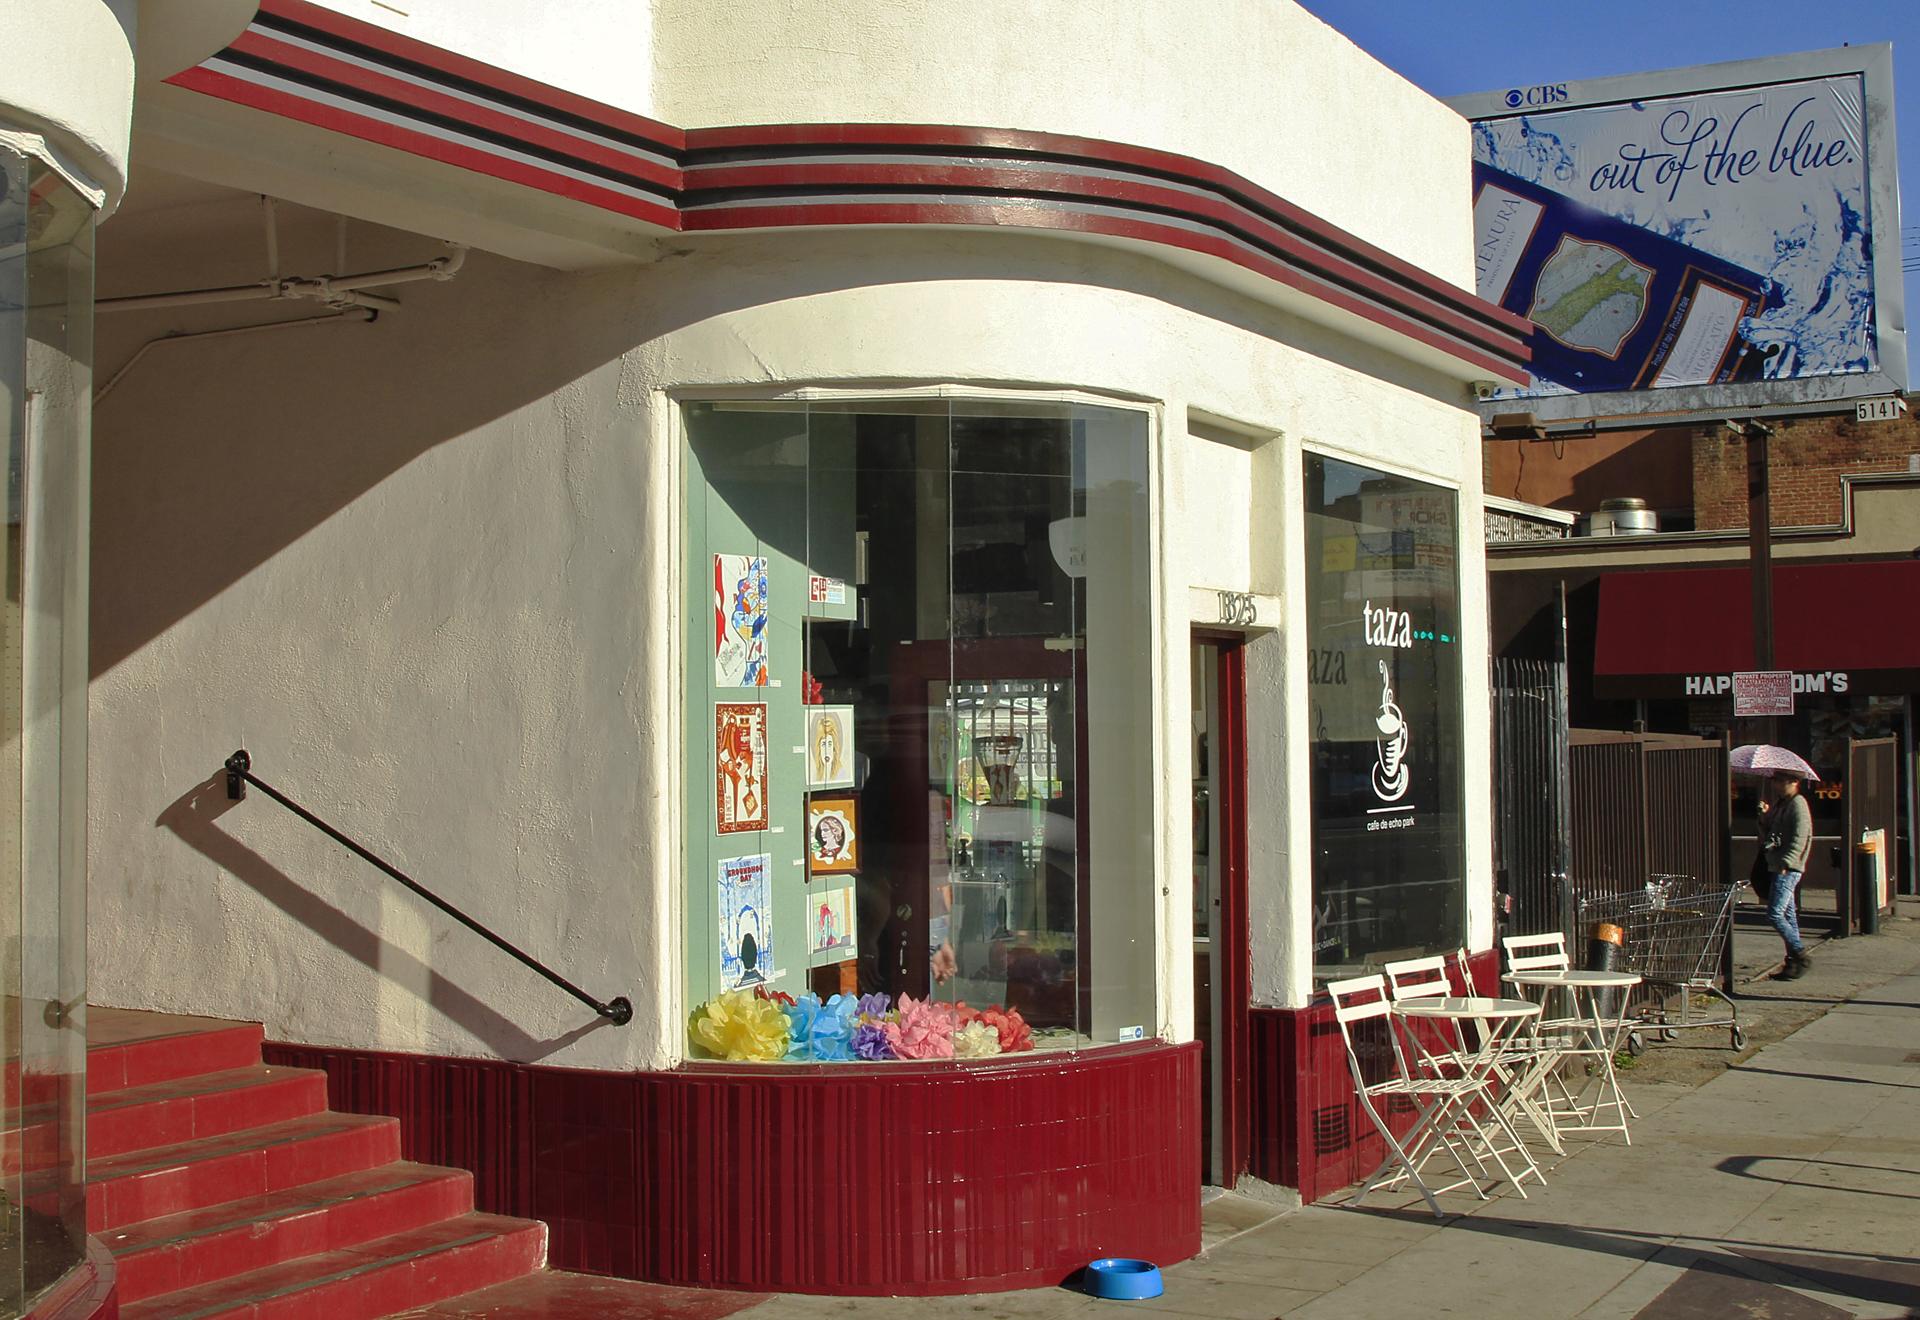 Taza Cafe - 1825 W. Sunset Blvd, Los Angeles, CA 90026